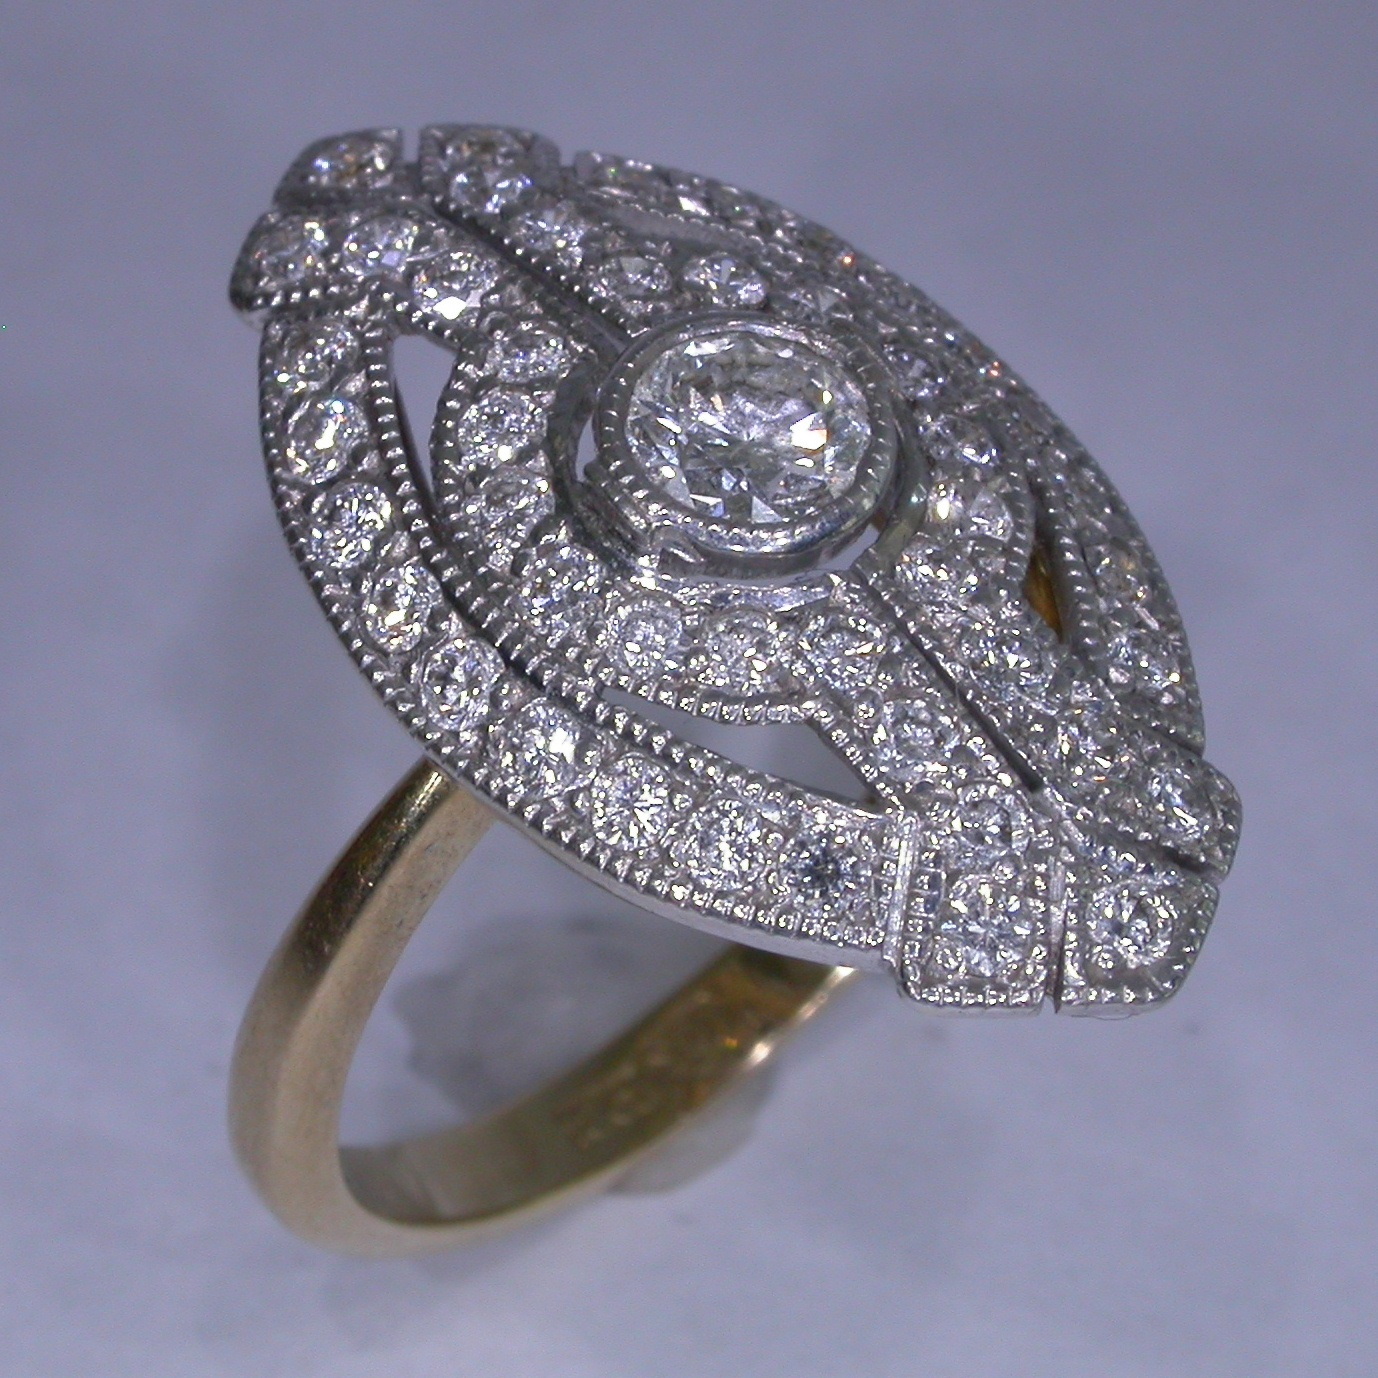 Diamond Engagement Ring - #6859